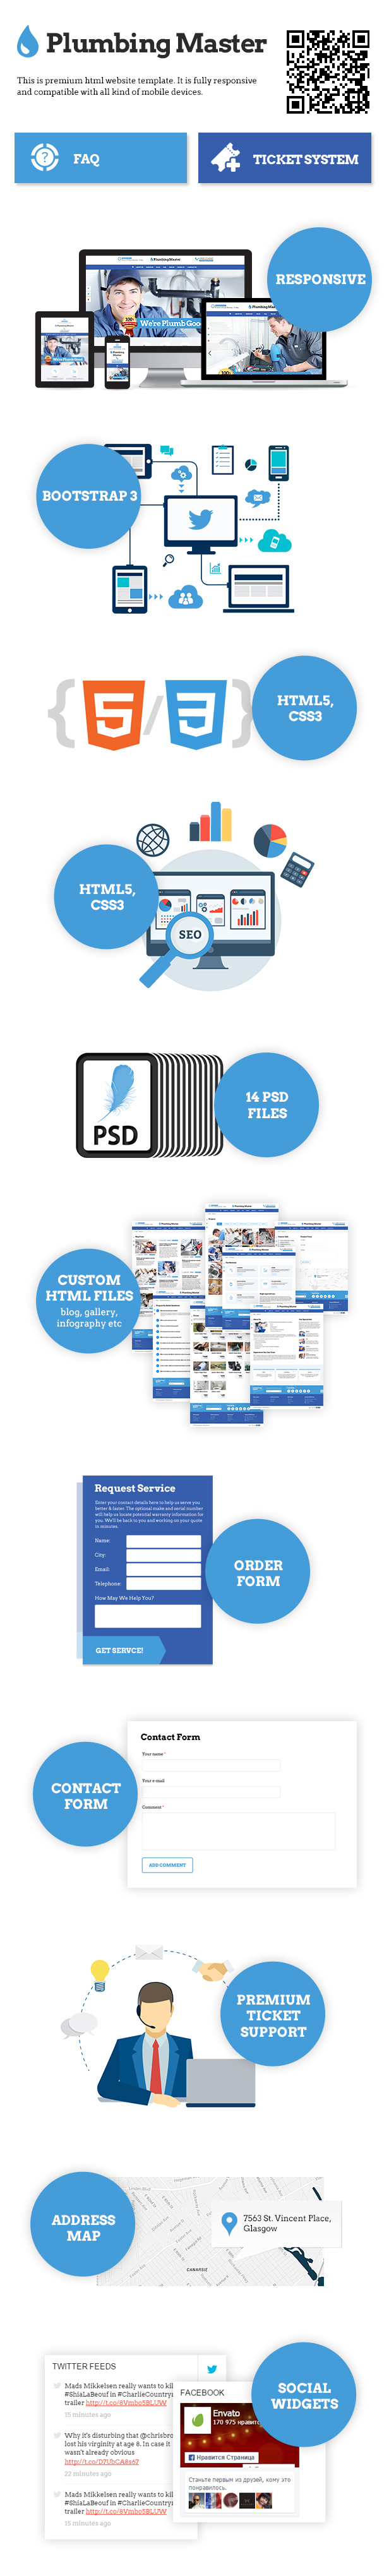 Plumbing Master Website Templates Pinterest Template And Website - Html website code template